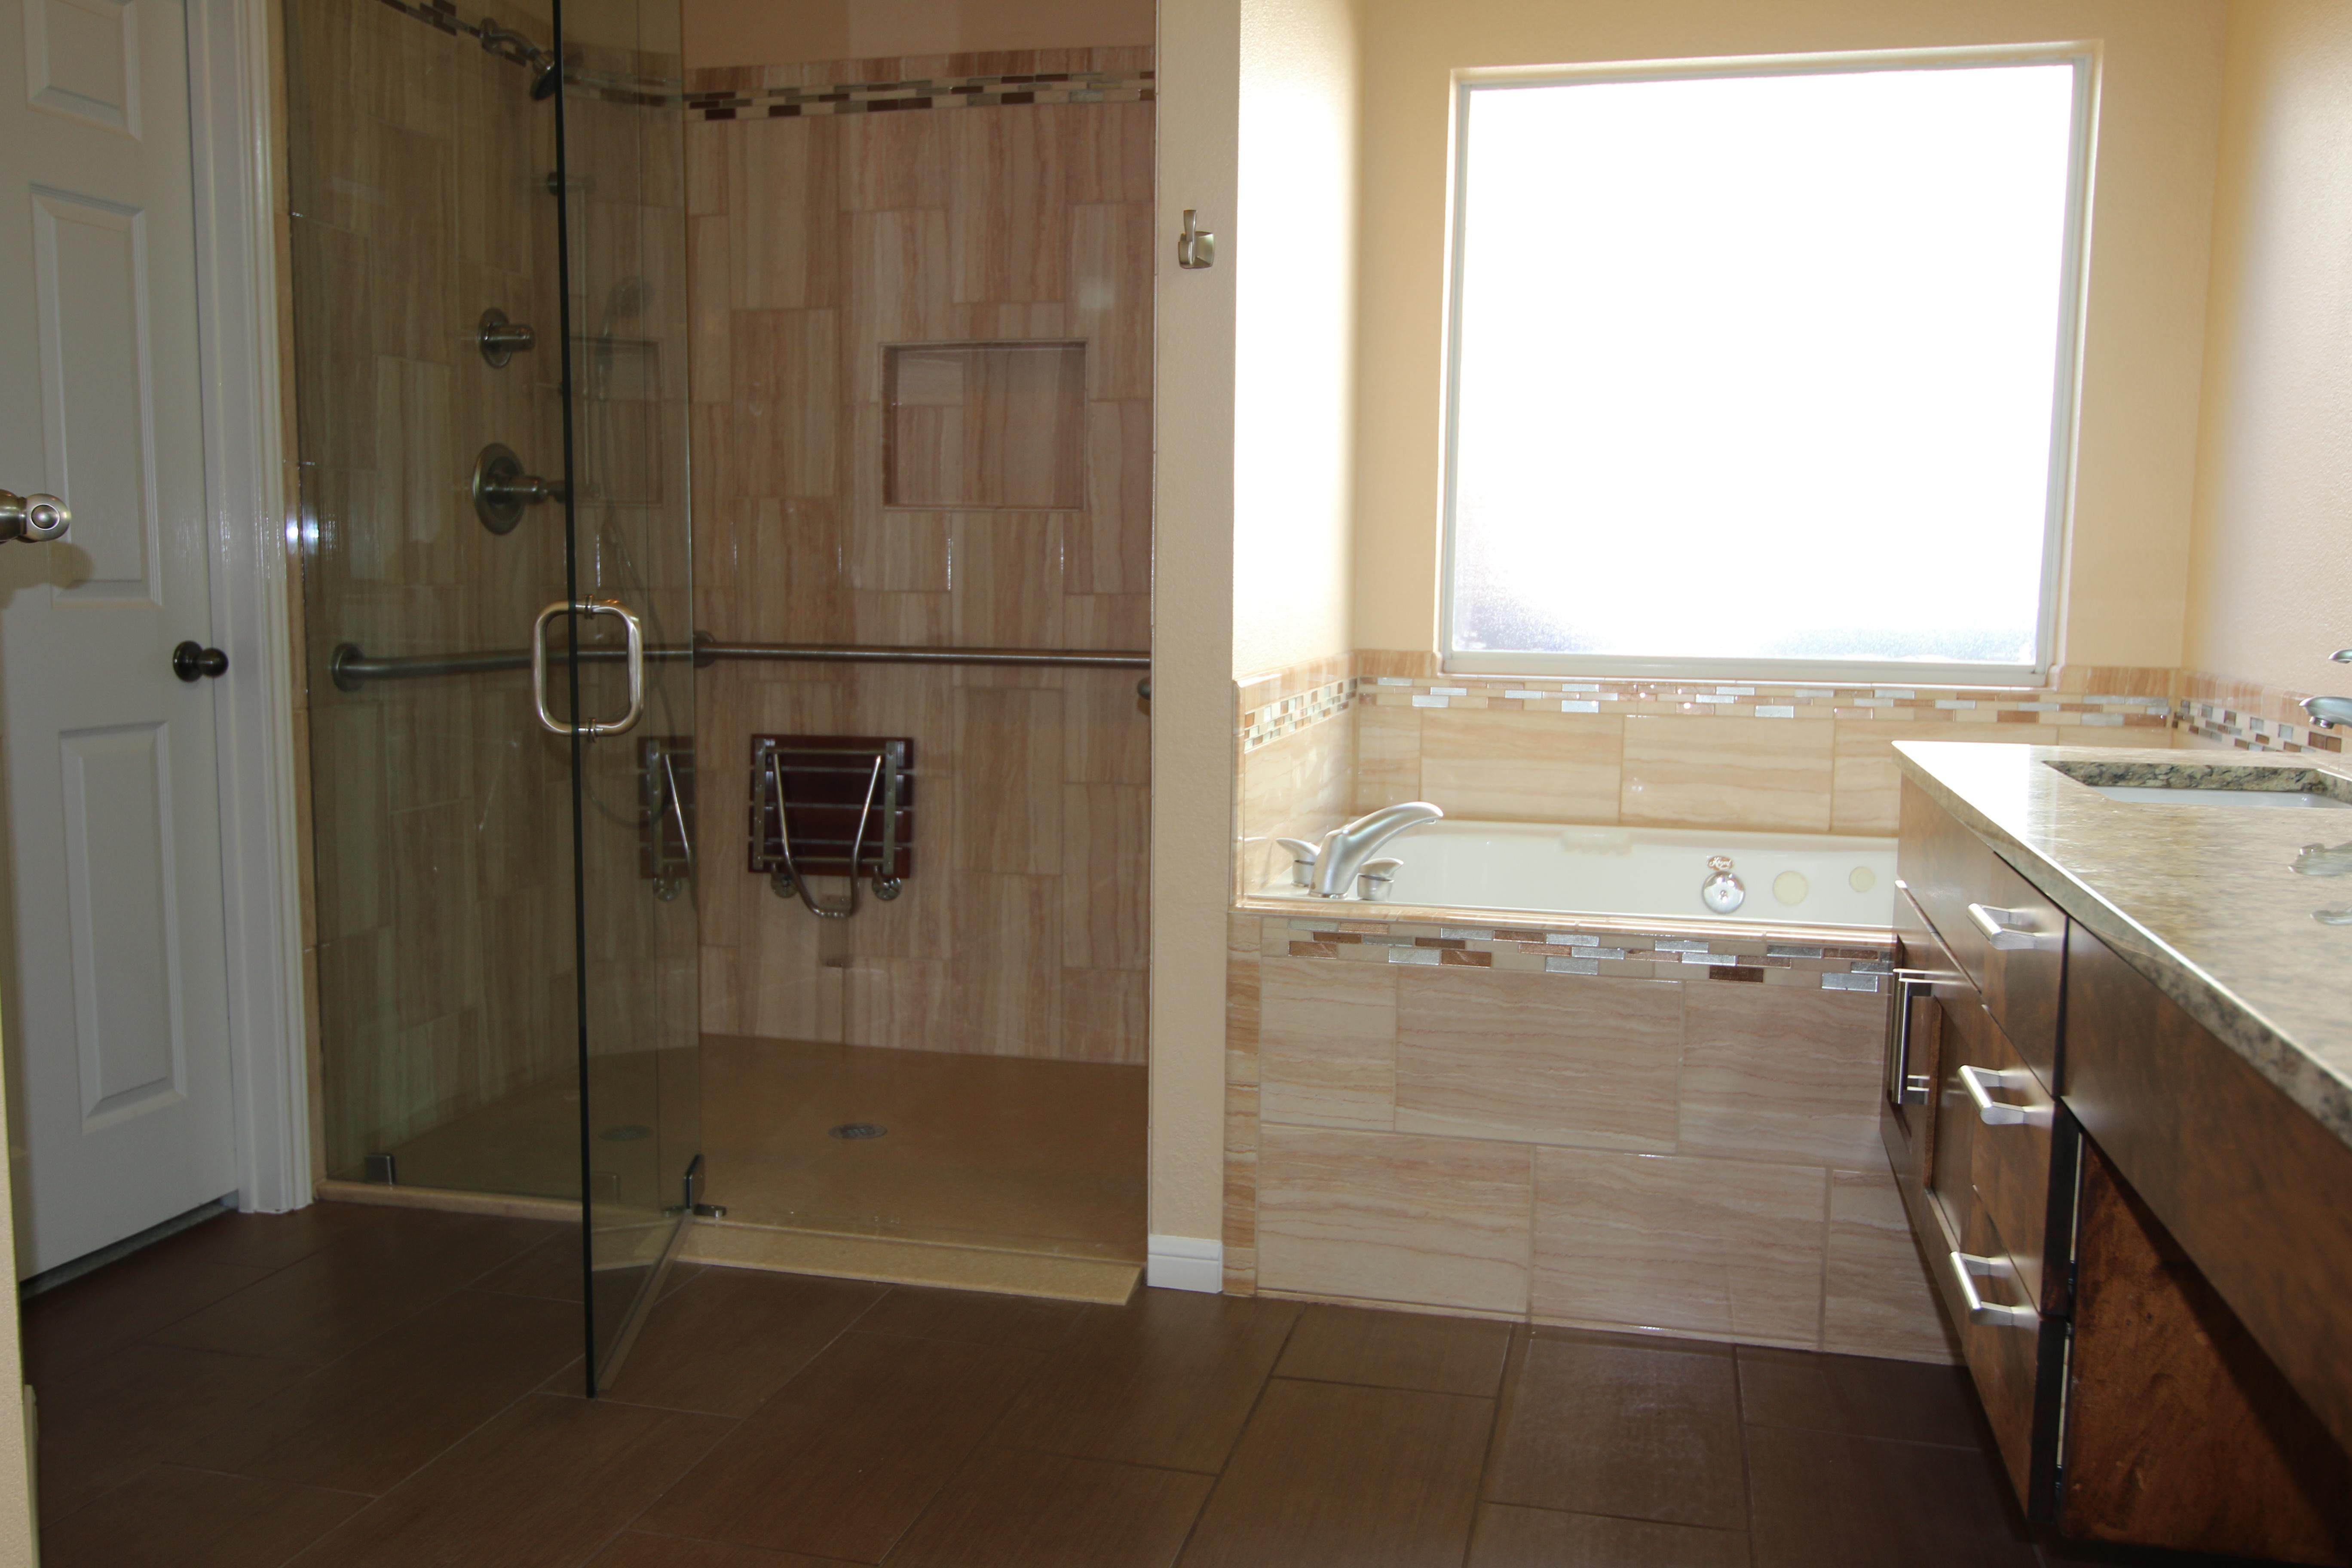 Disability Bathroom Remodels In Austin, Texas